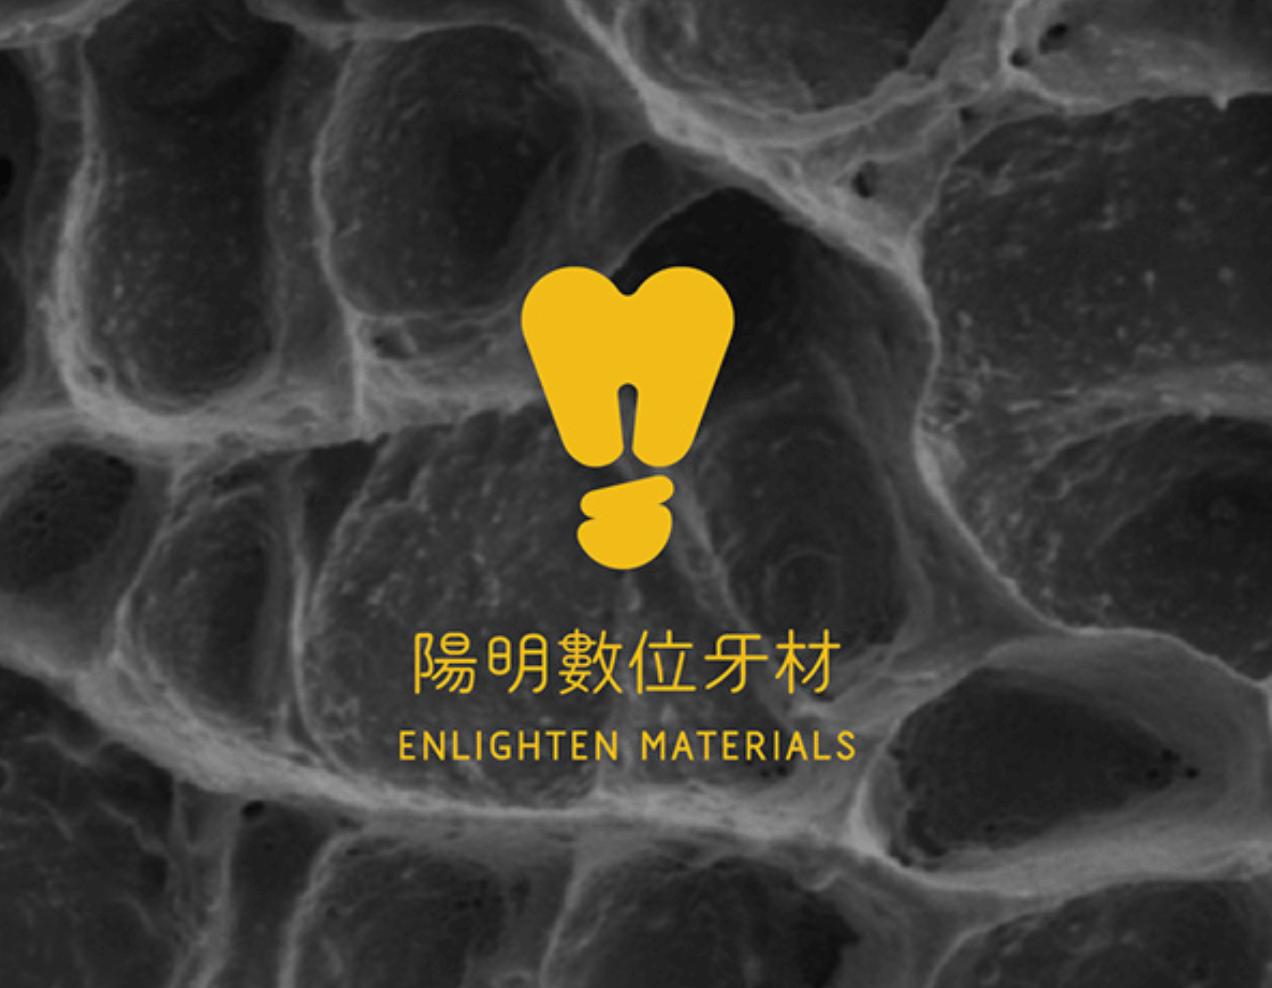 Visual Identity| Enlighten Materials 陽明數位牙材 品牌設計